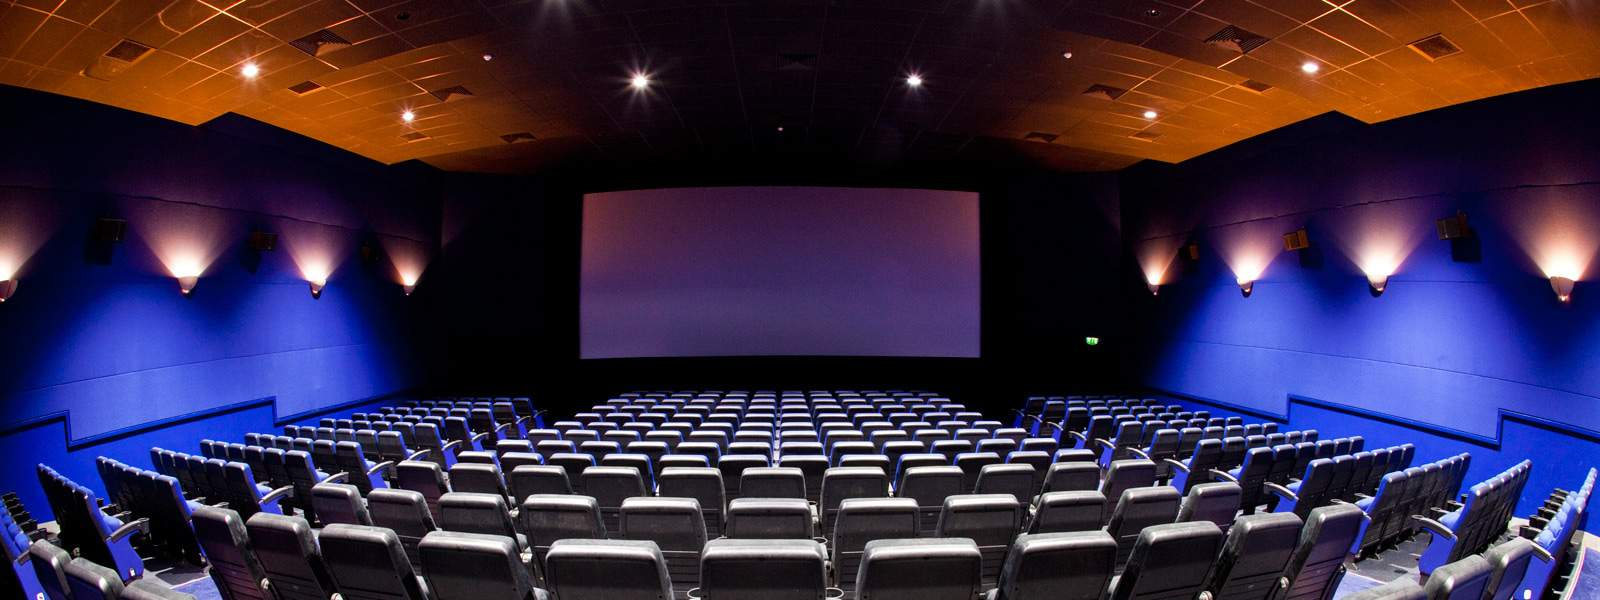 The Best of Bracknell Cinema - 247 airport ride